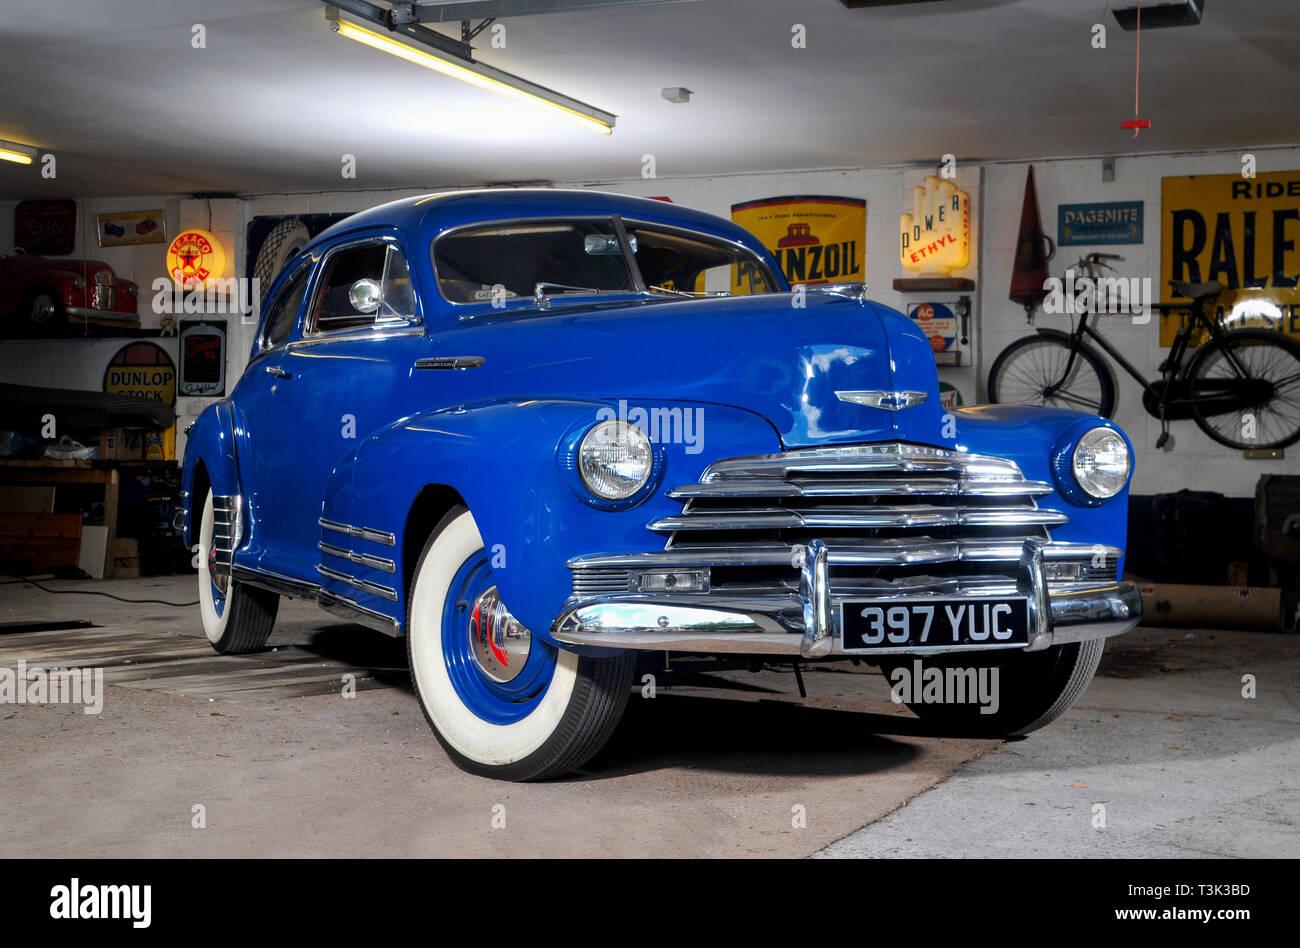 1946 Chevrolet, Classic American car Stock Photo